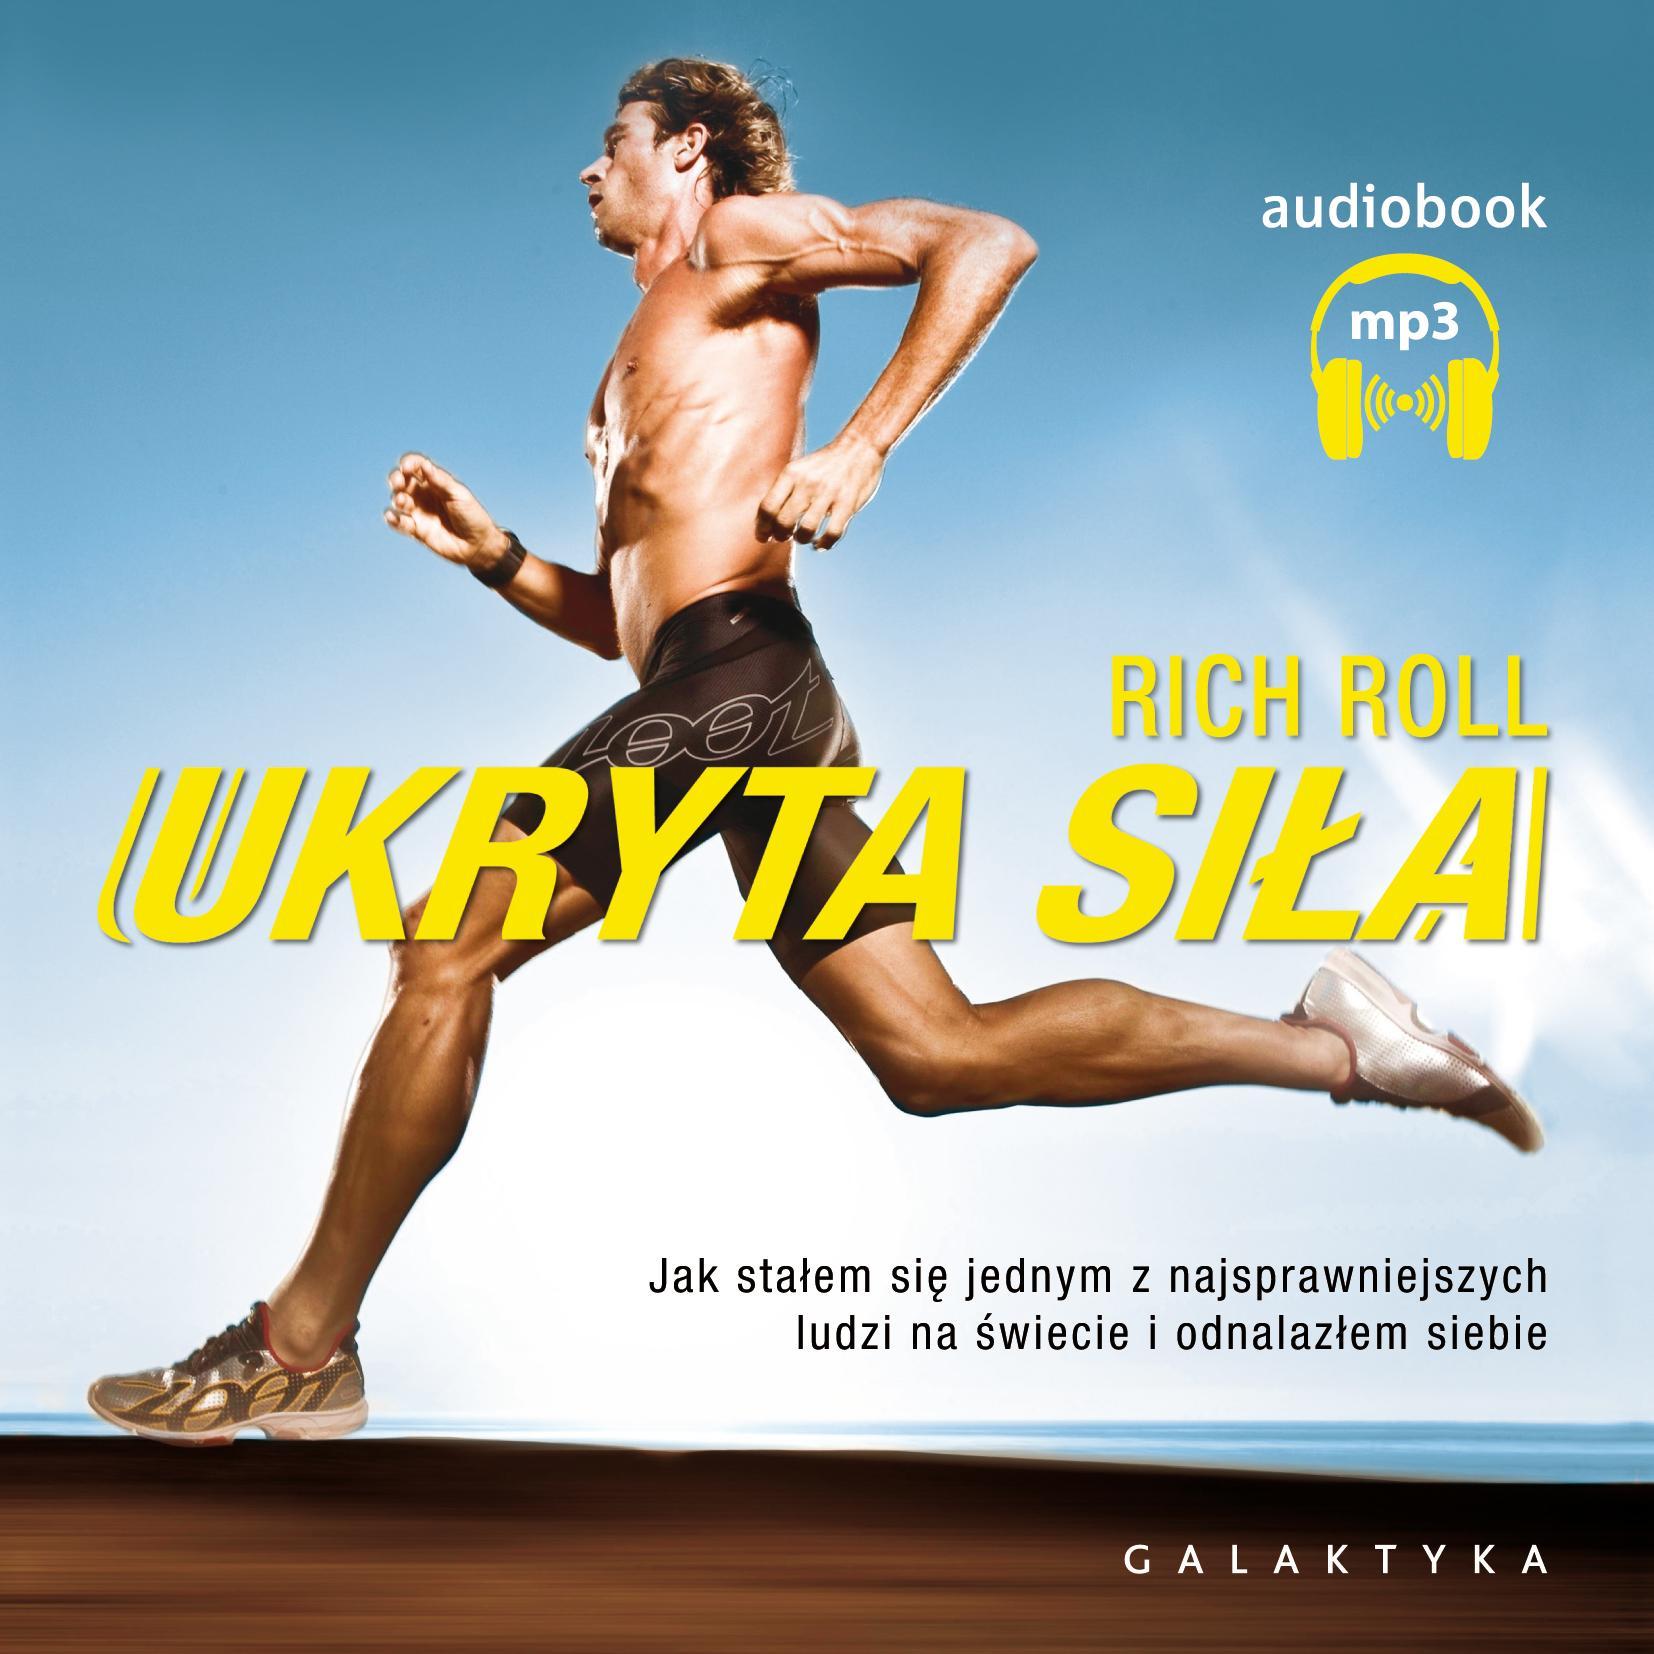 Ukryta siła audiobook